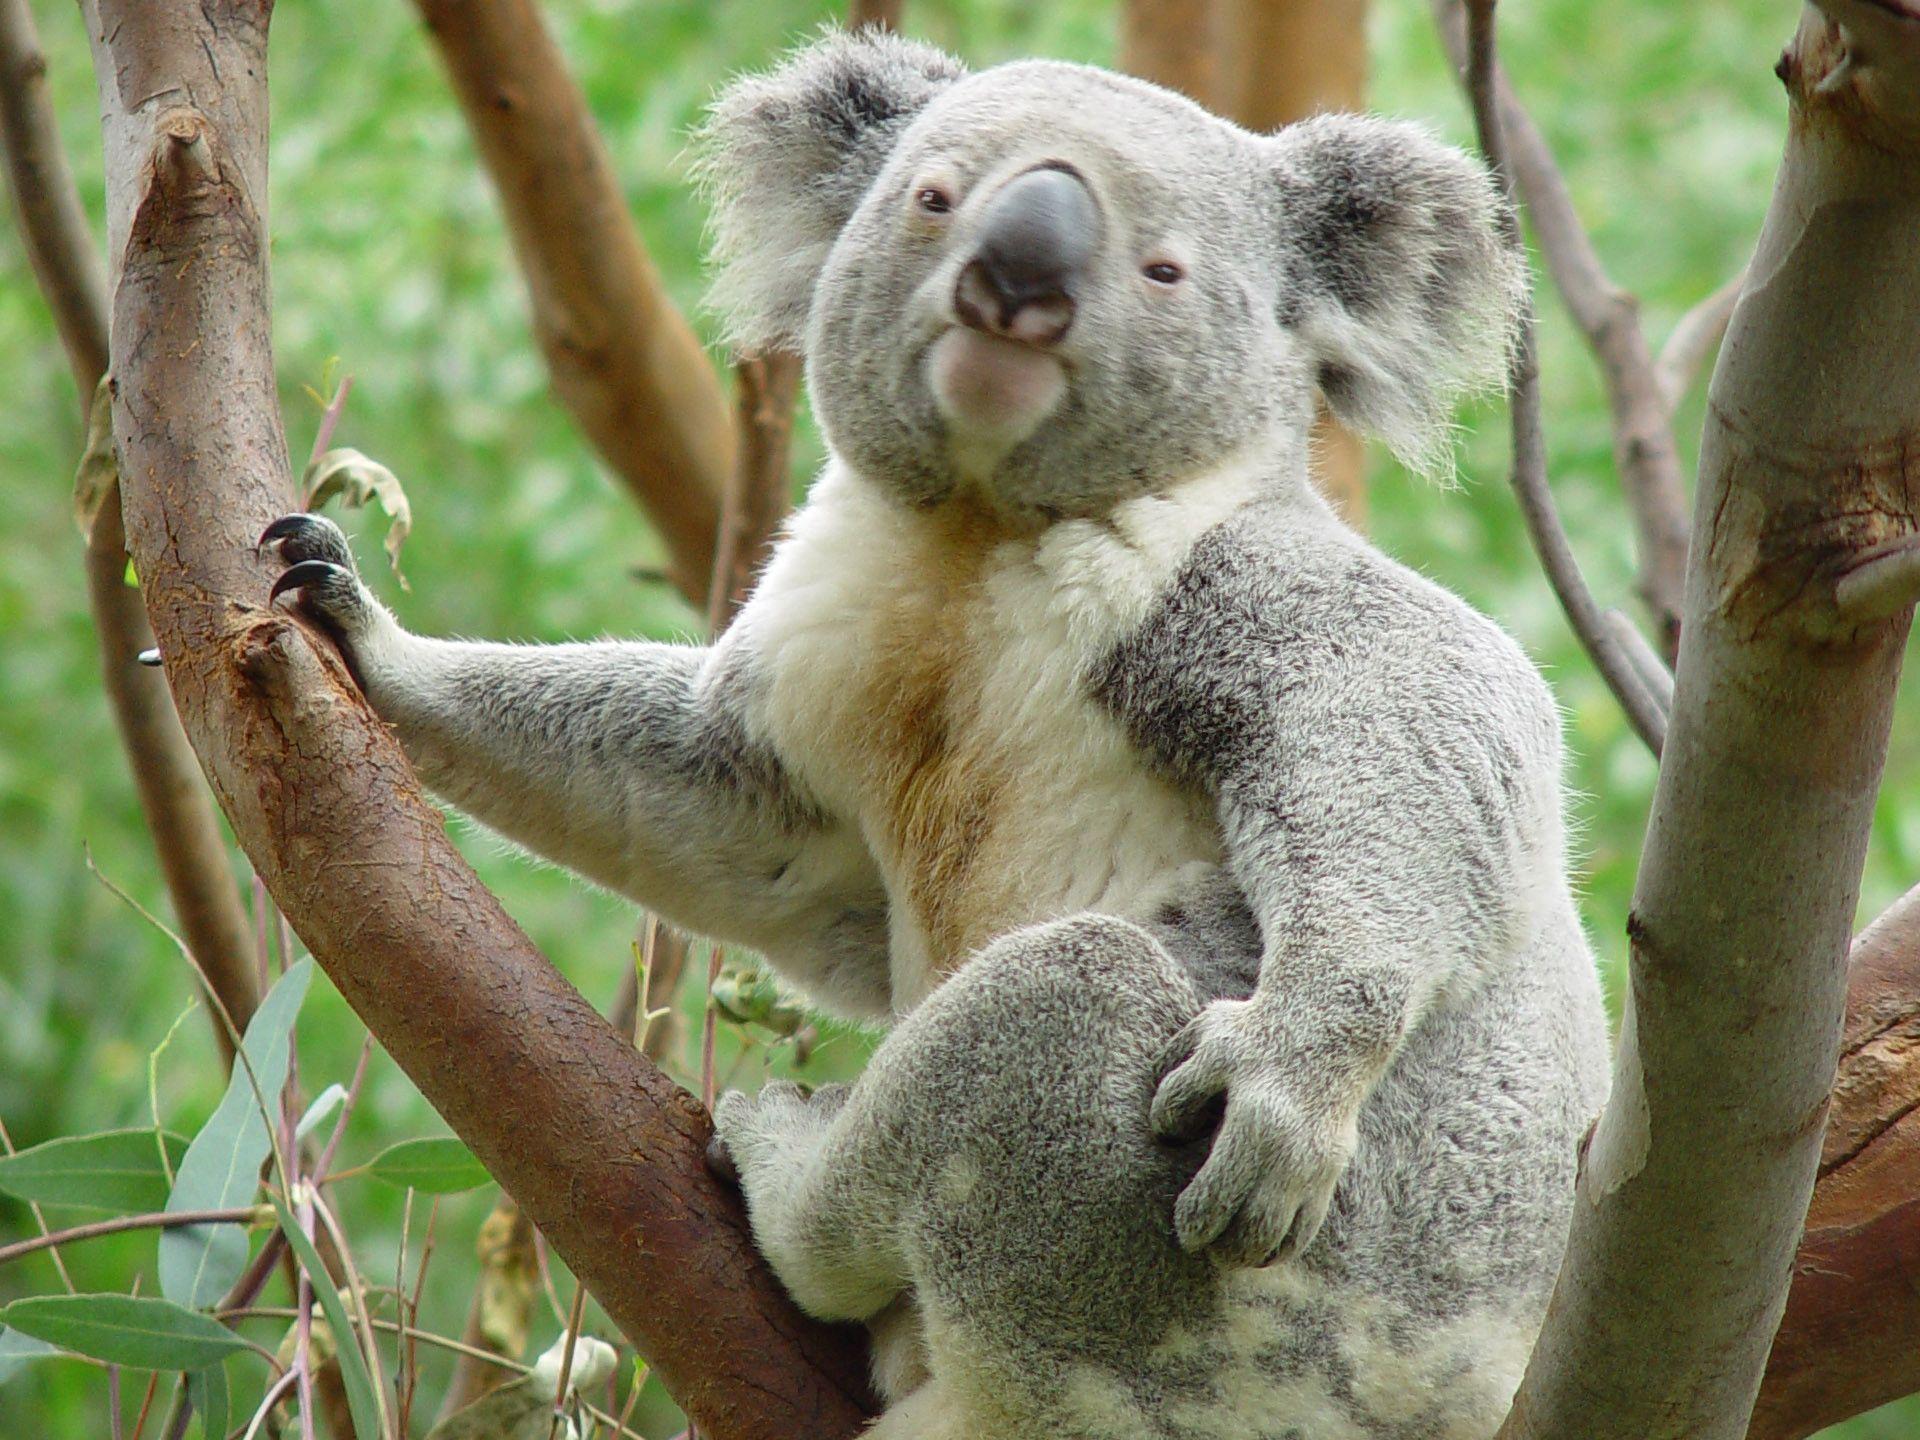 Cute And Funny Baby Koala Wallpaper Koala Wallpapers Wallpaper Cave